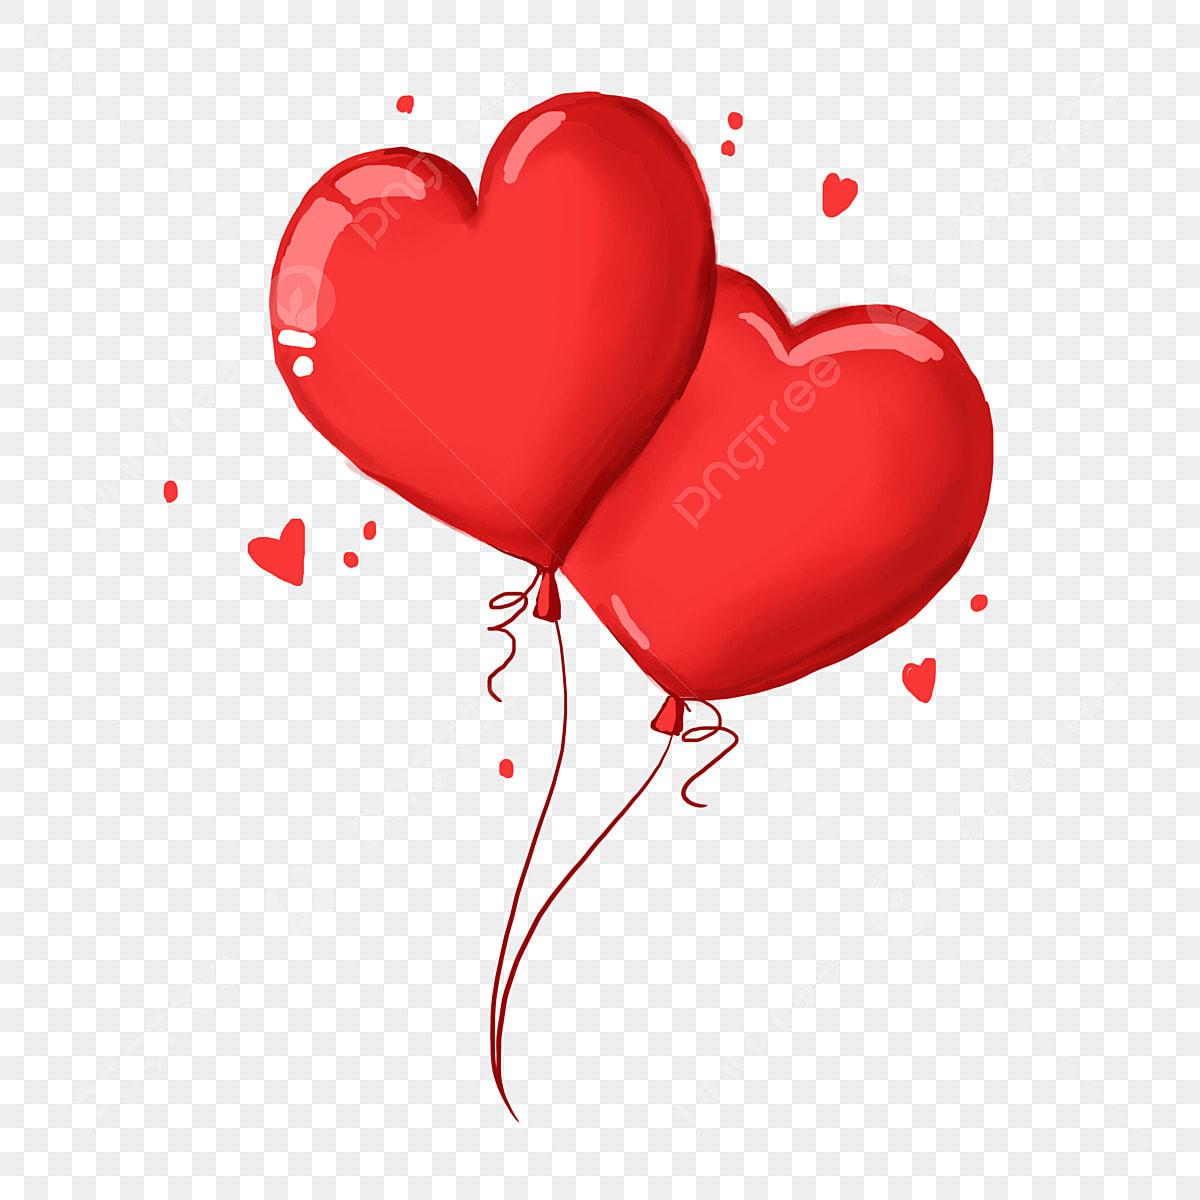 Lượm từ FB Pngtree-heart-shaped-balloon-cartoon-illustration-hand-drawn-valentine-illustration-valentines-day-png-image_3877345